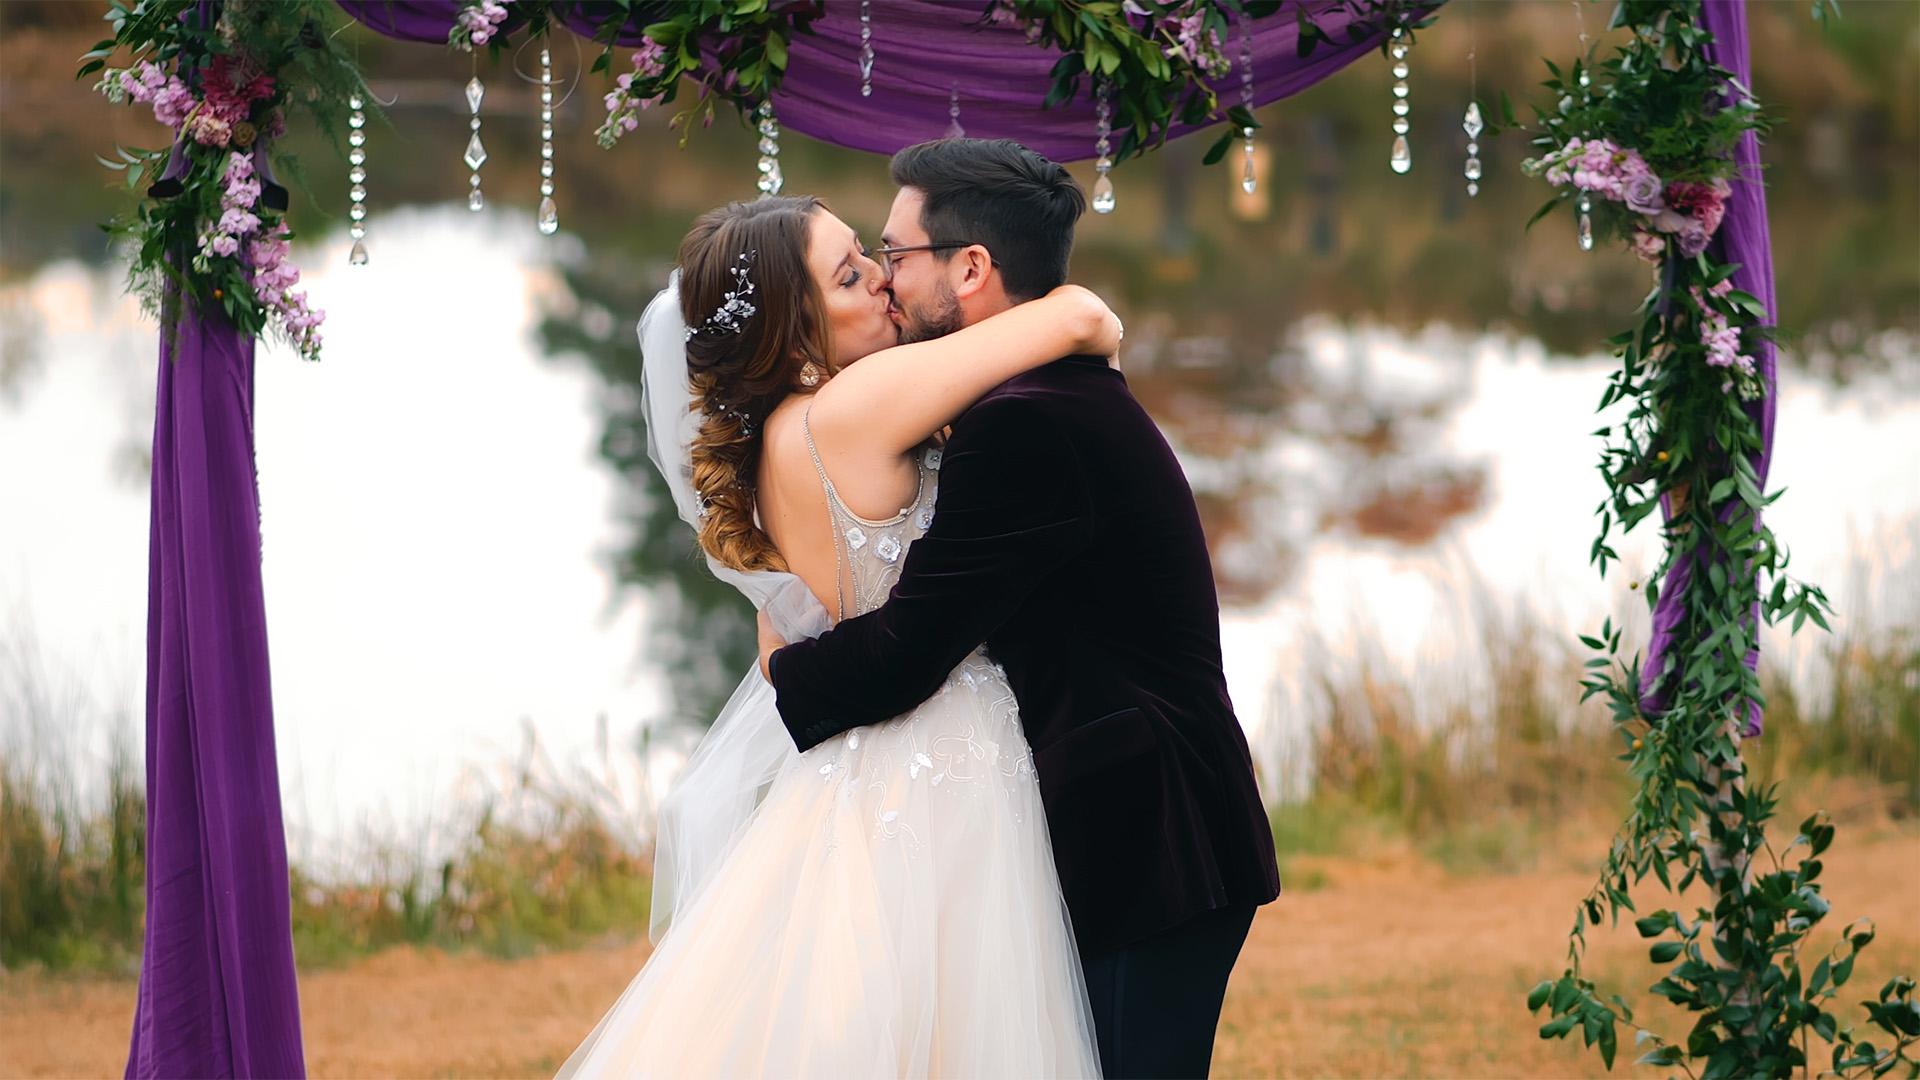 Allie + Andrew | Reva, Virginia | Walden Hall